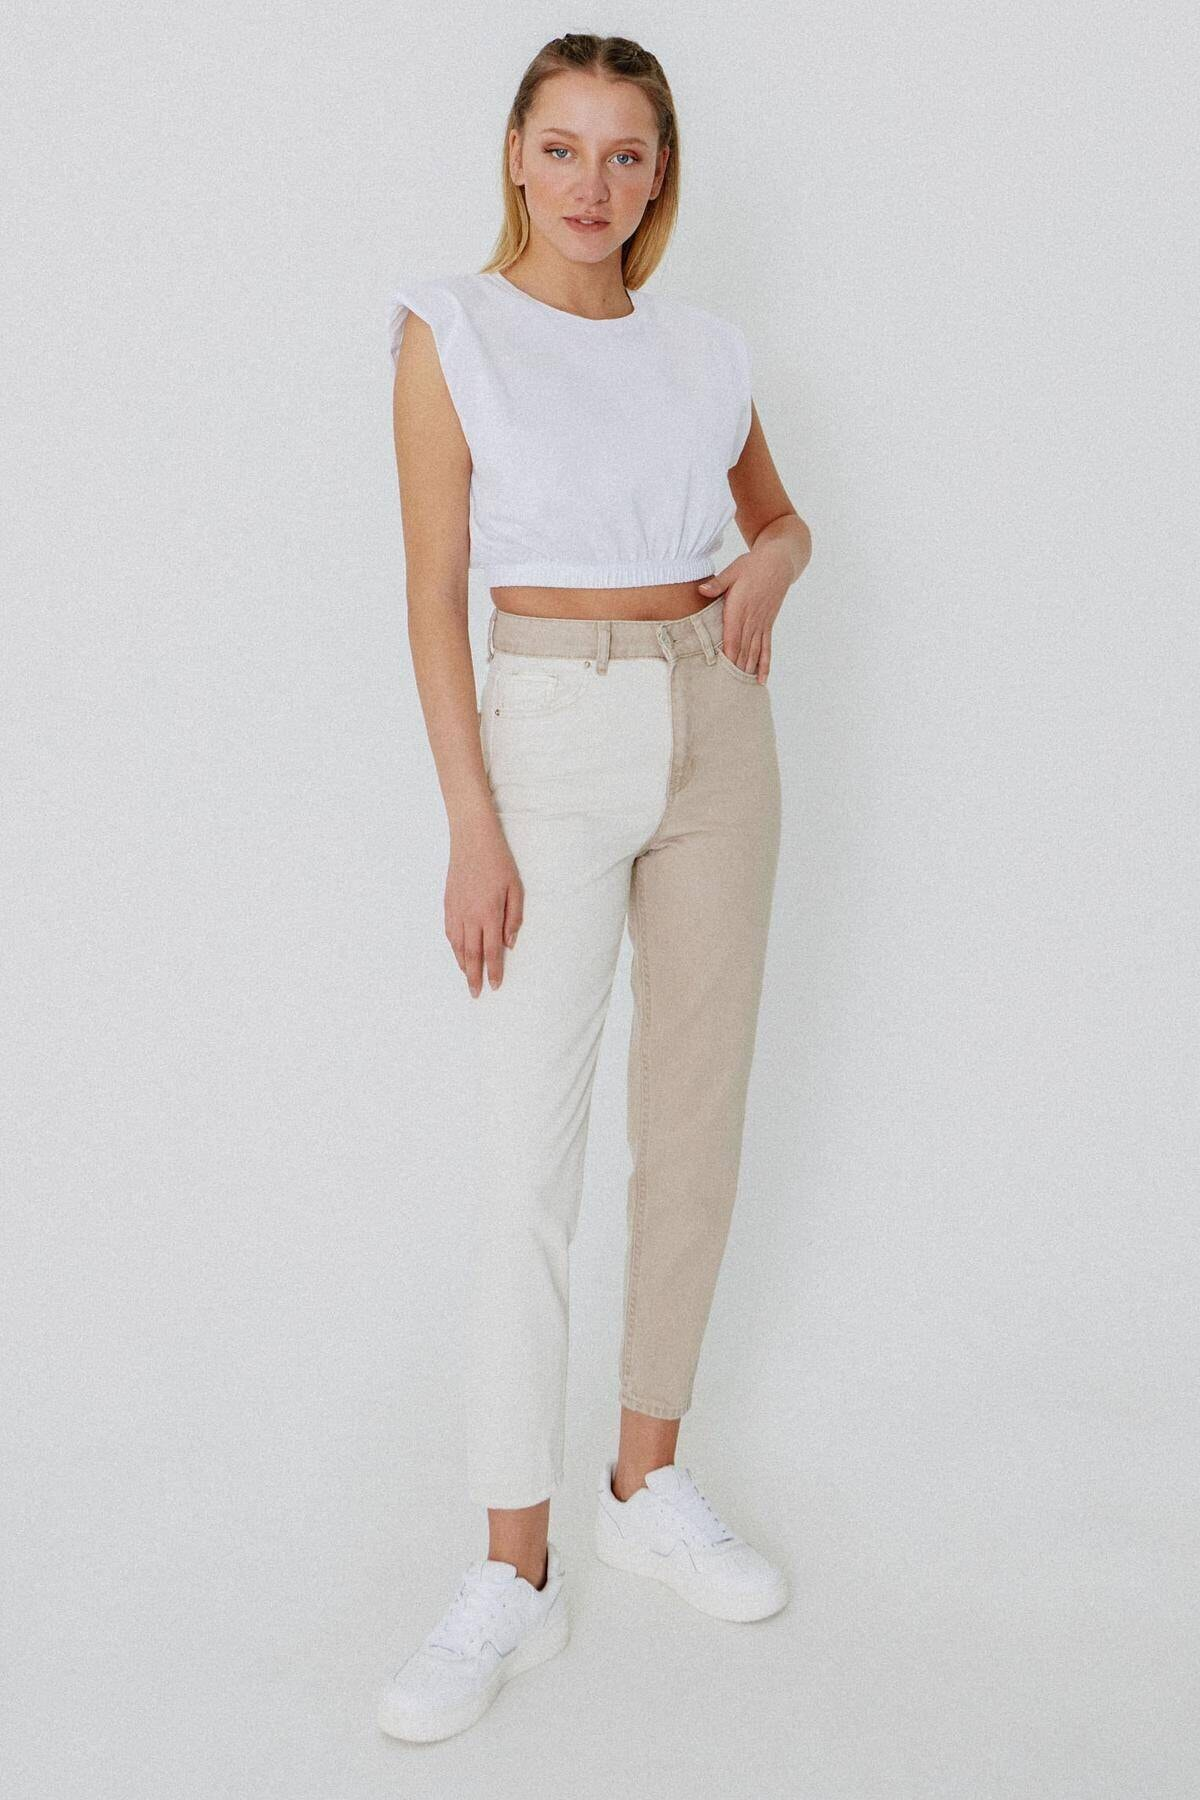 Addax Kadın Bej Beyaz Çift Renkli Pantolon PN1133 - PNM ADX-0000024053